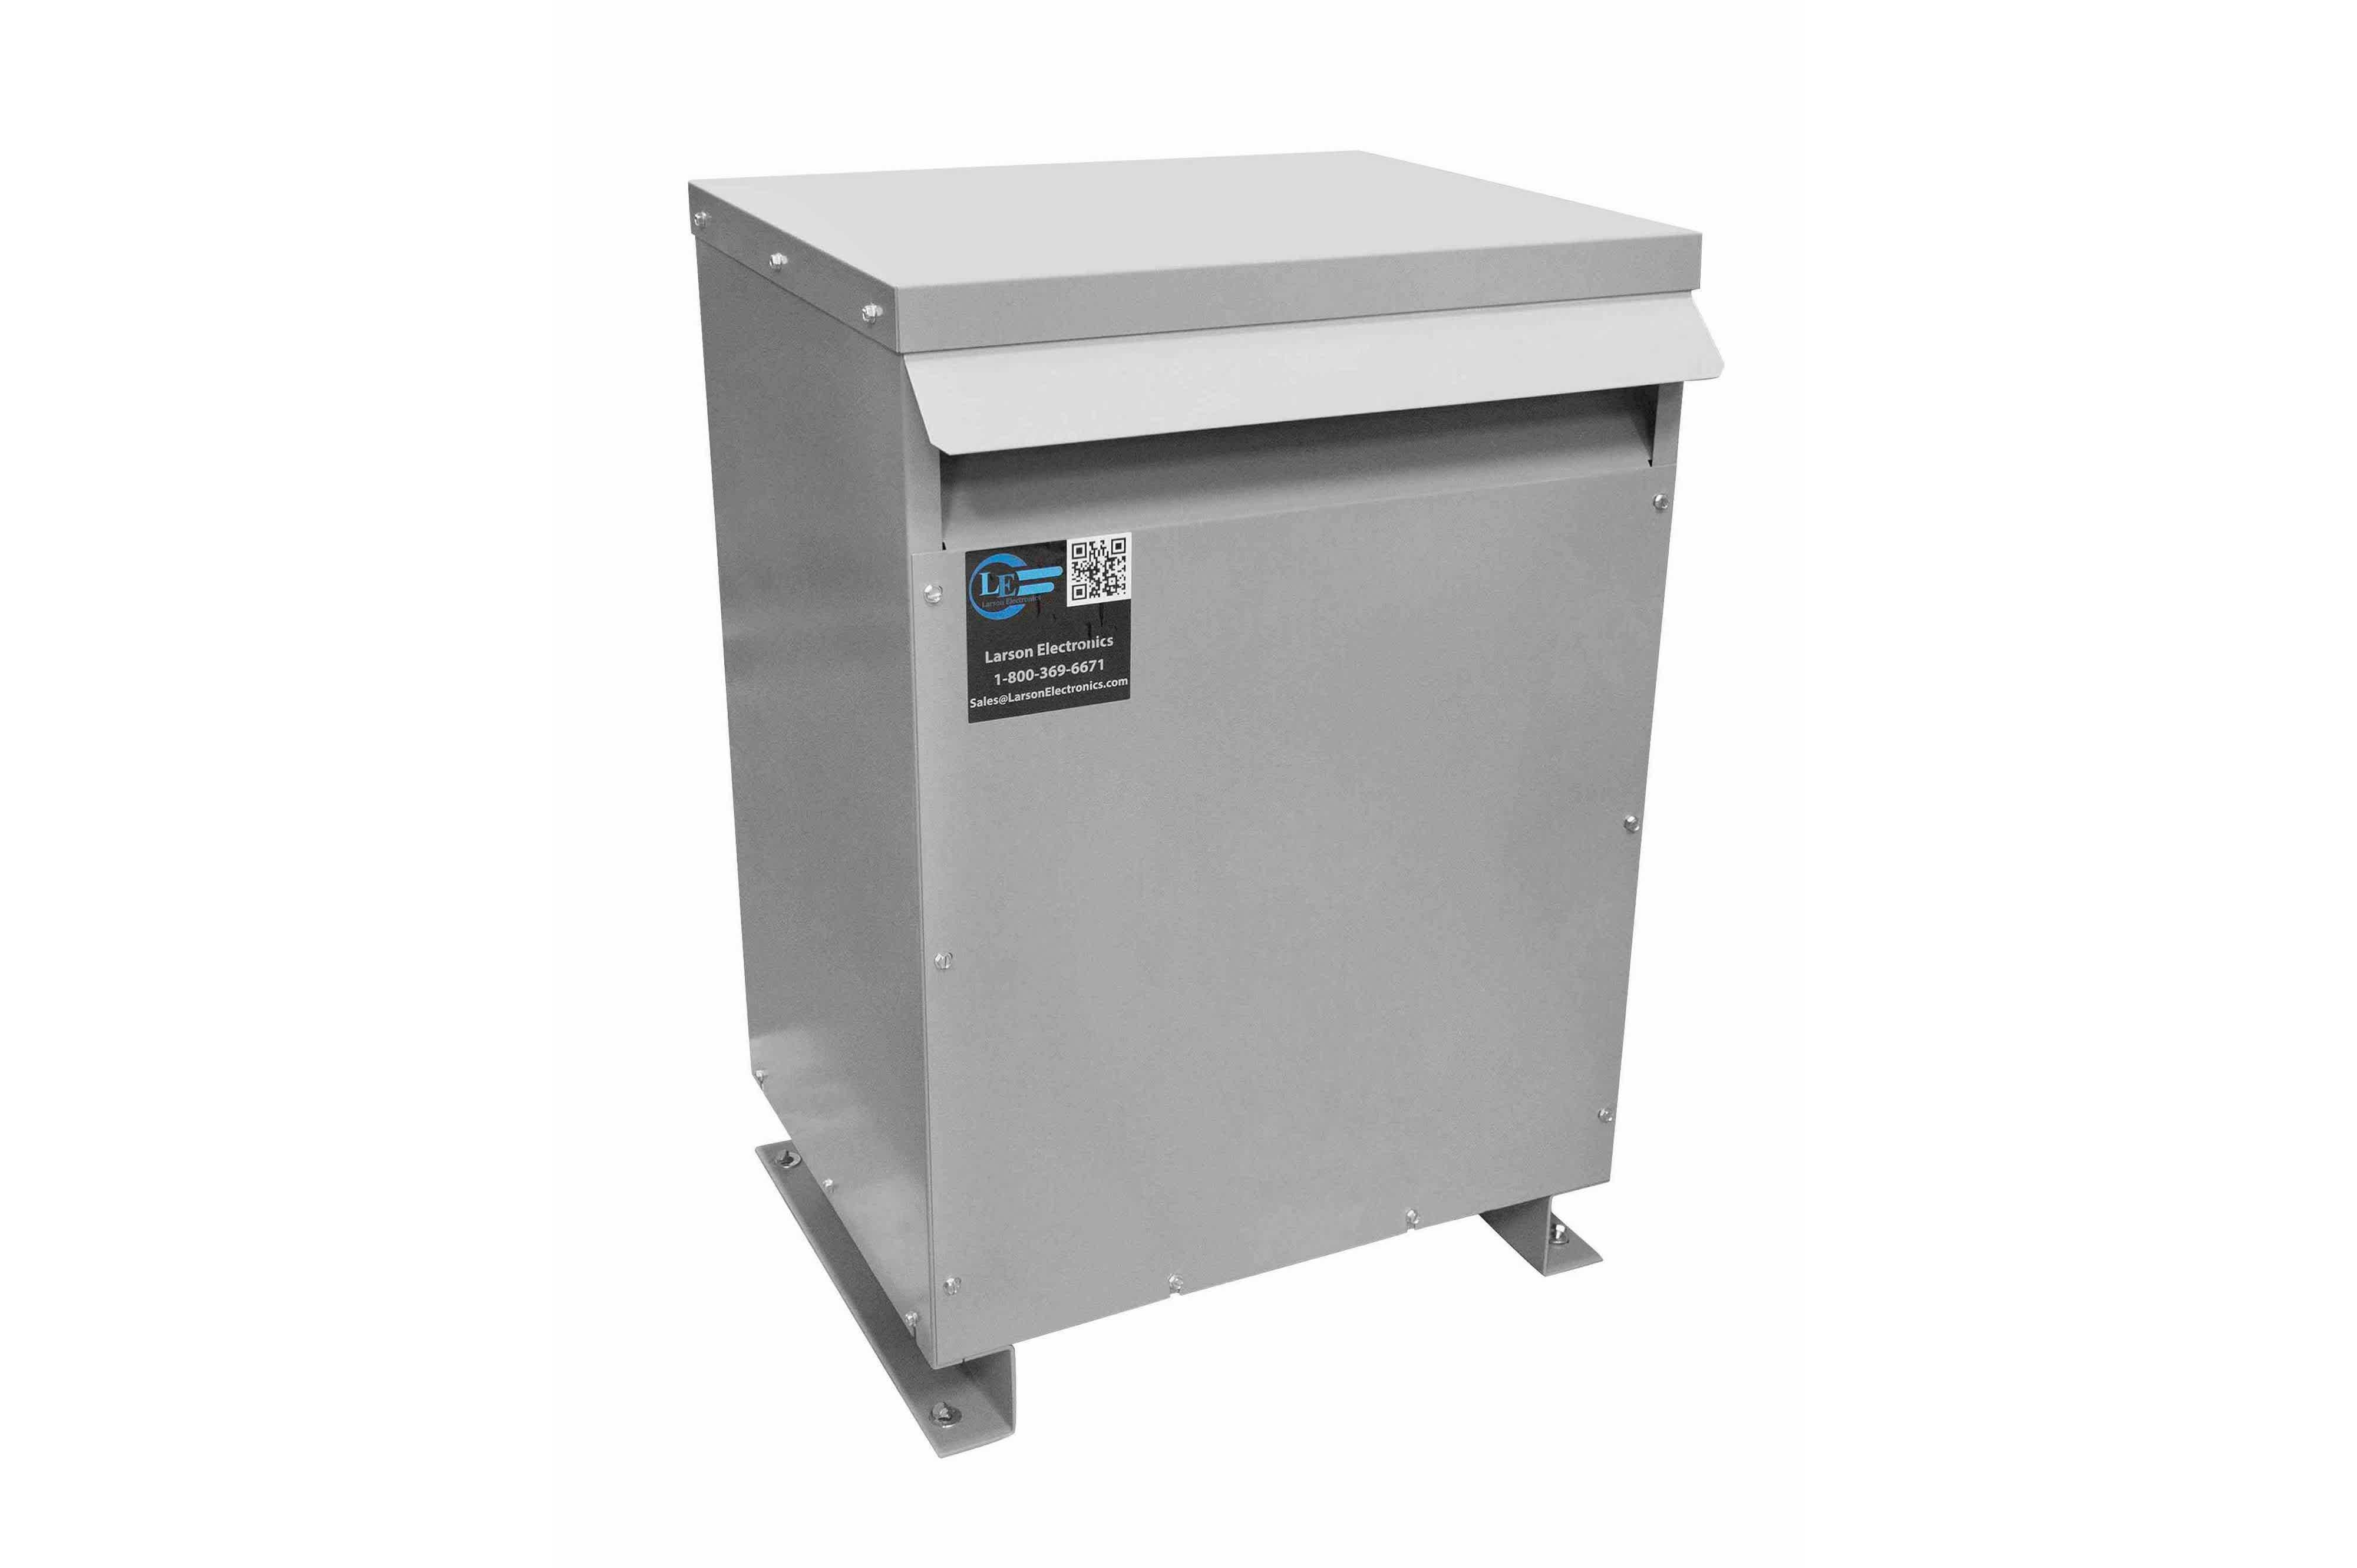 37.5 kVA 3PH Isolation Transformer, 415V Wye Primary, 208V Delta Secondary, N3R, Ventilated, 60 Hz